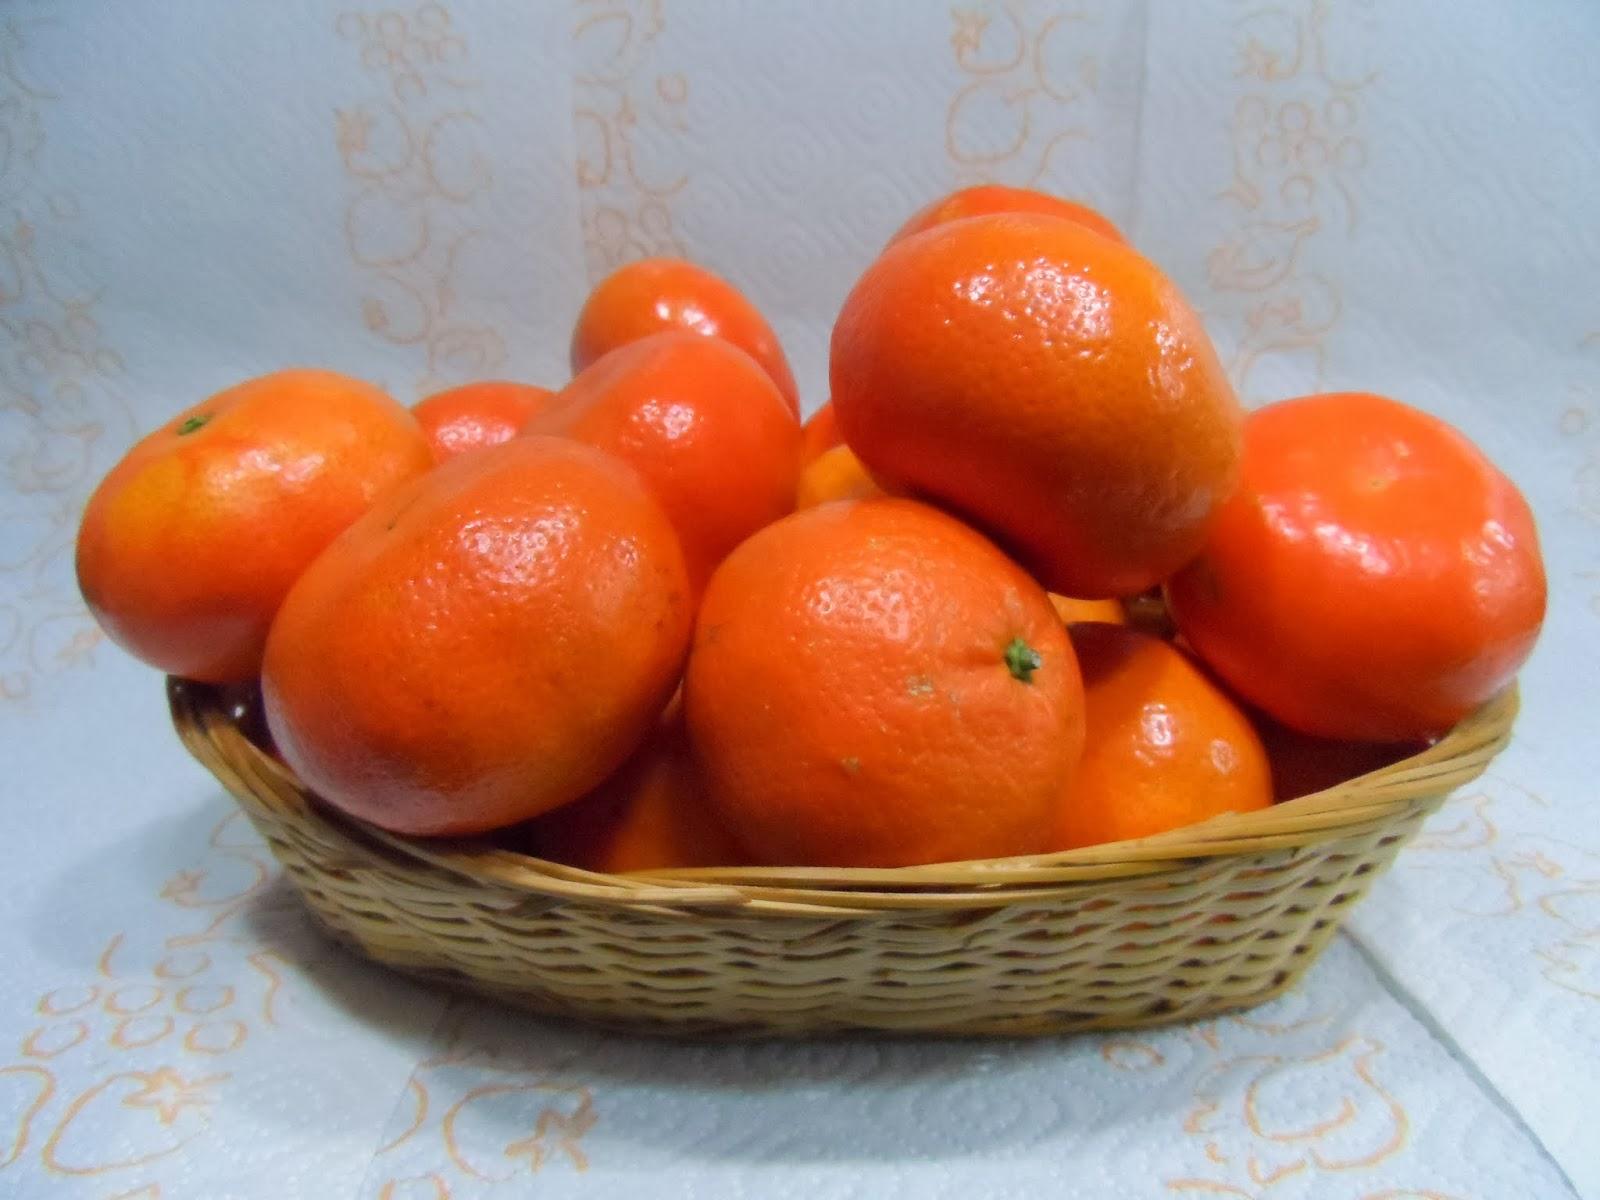 omnilife acido urico vinagre de manzana contra acido urico comidas q producen acido urico